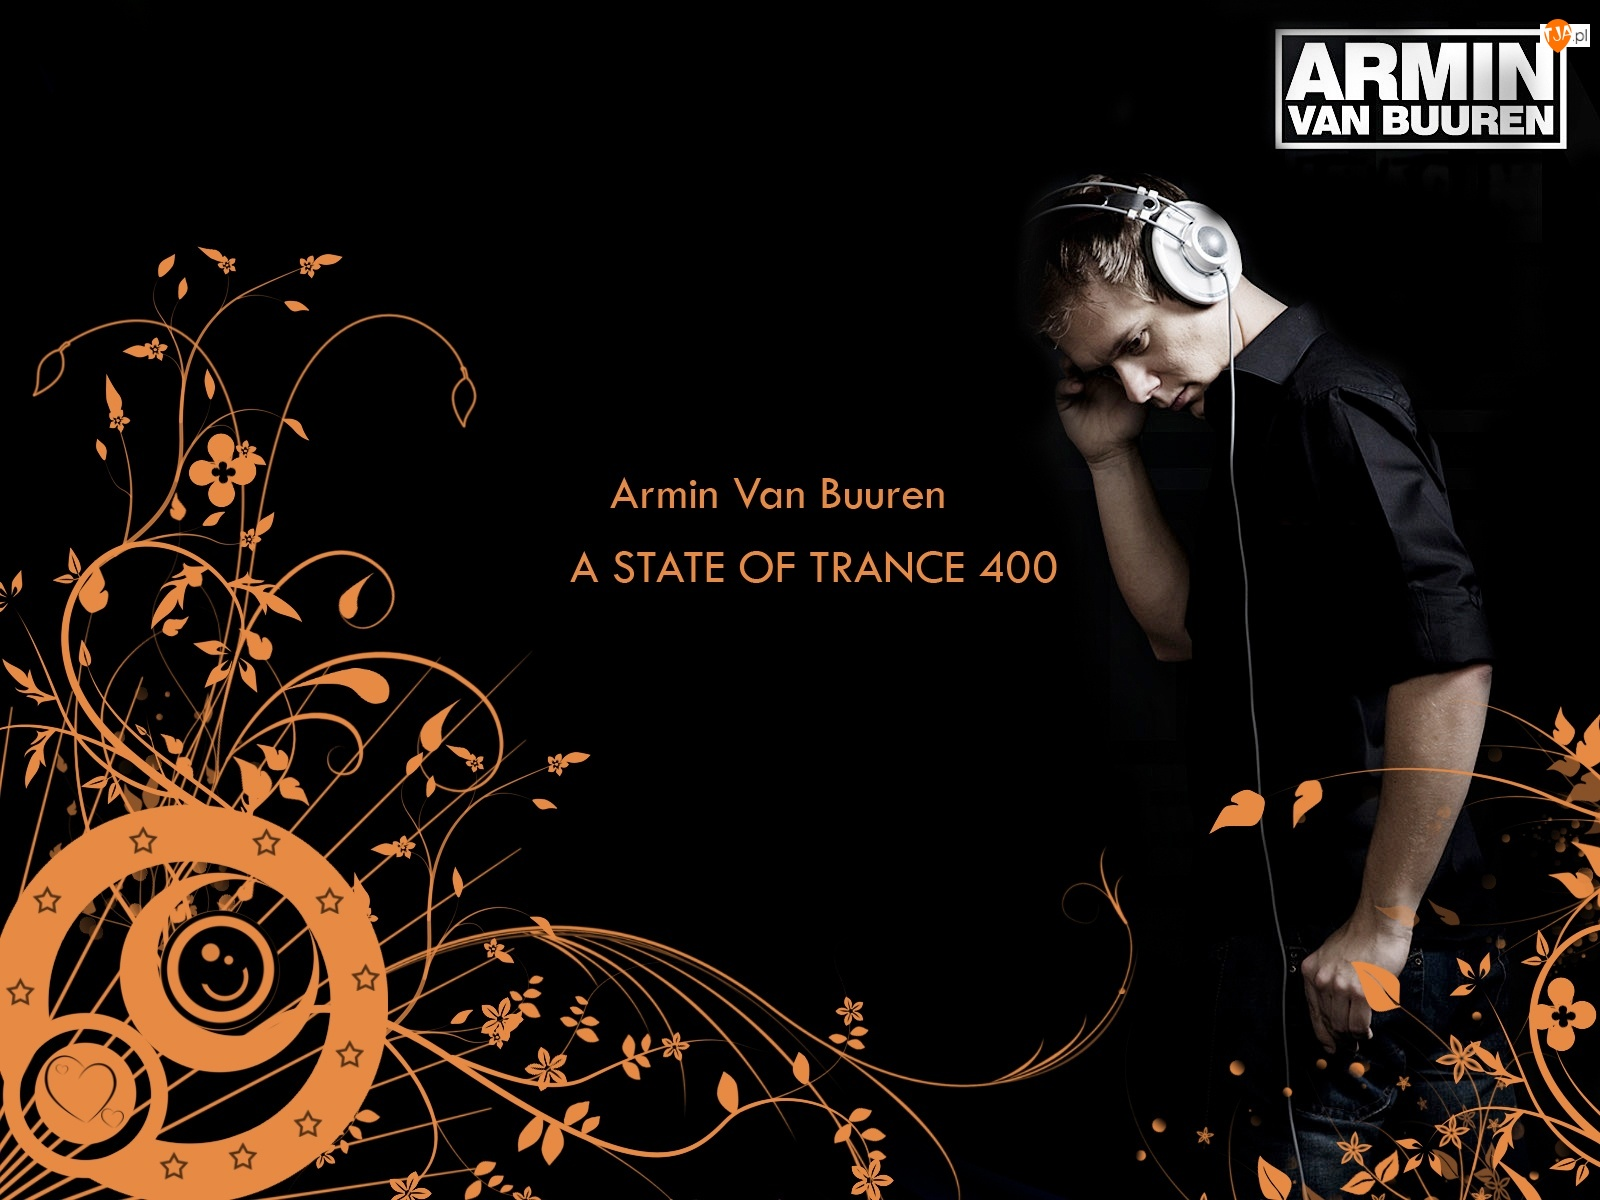 A State of Trance, Armin van Buuren